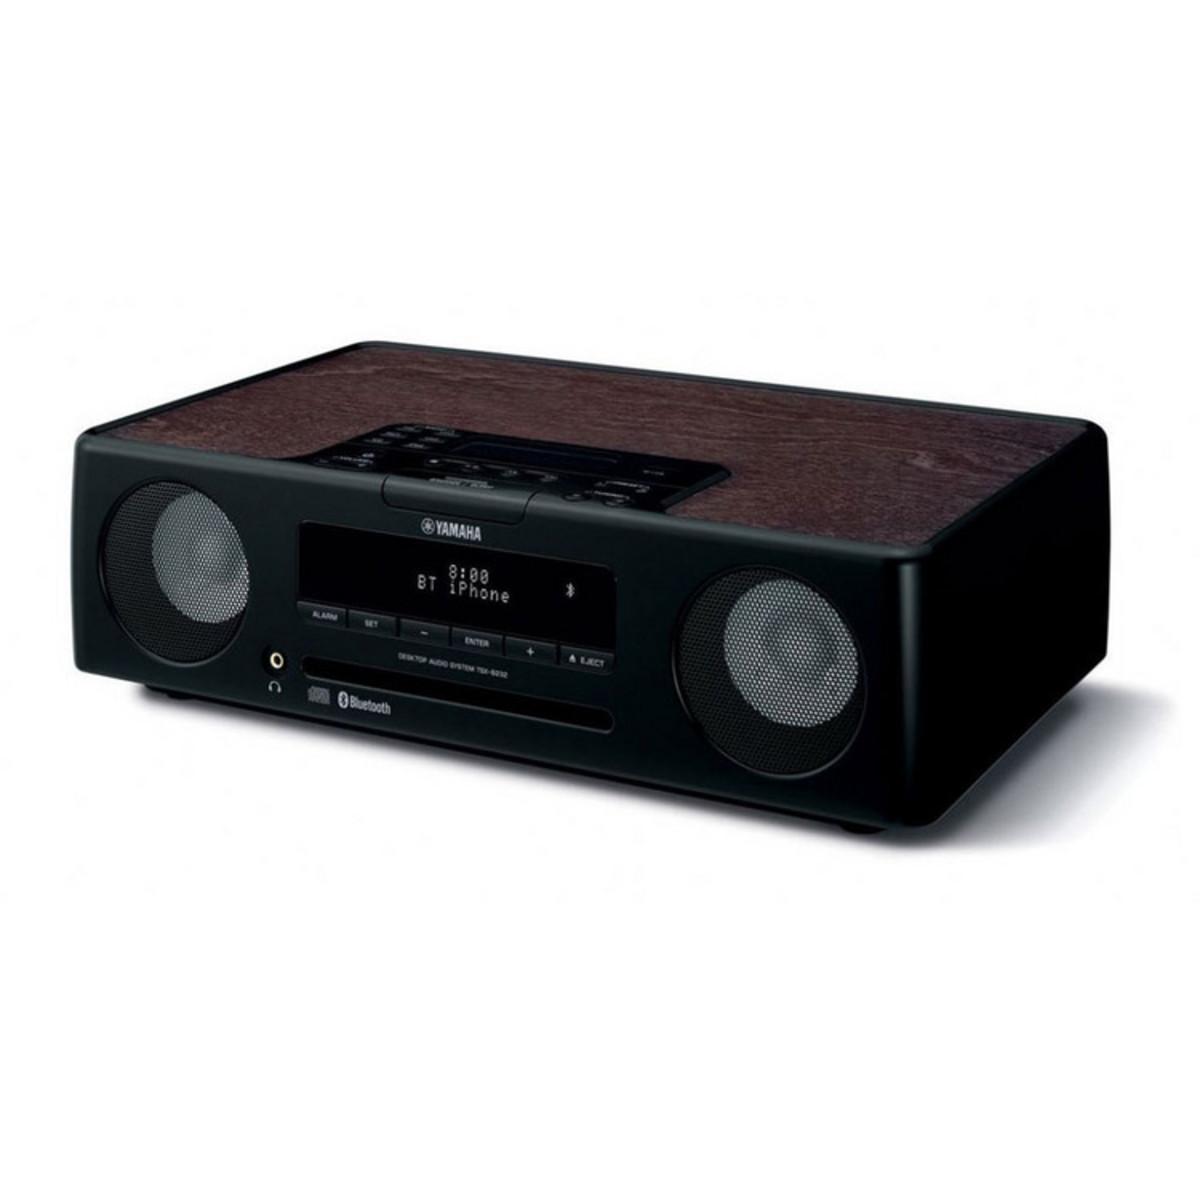 Disc yamaha tsx 132 speaker system with ipod dock black for Yamaha sound dock